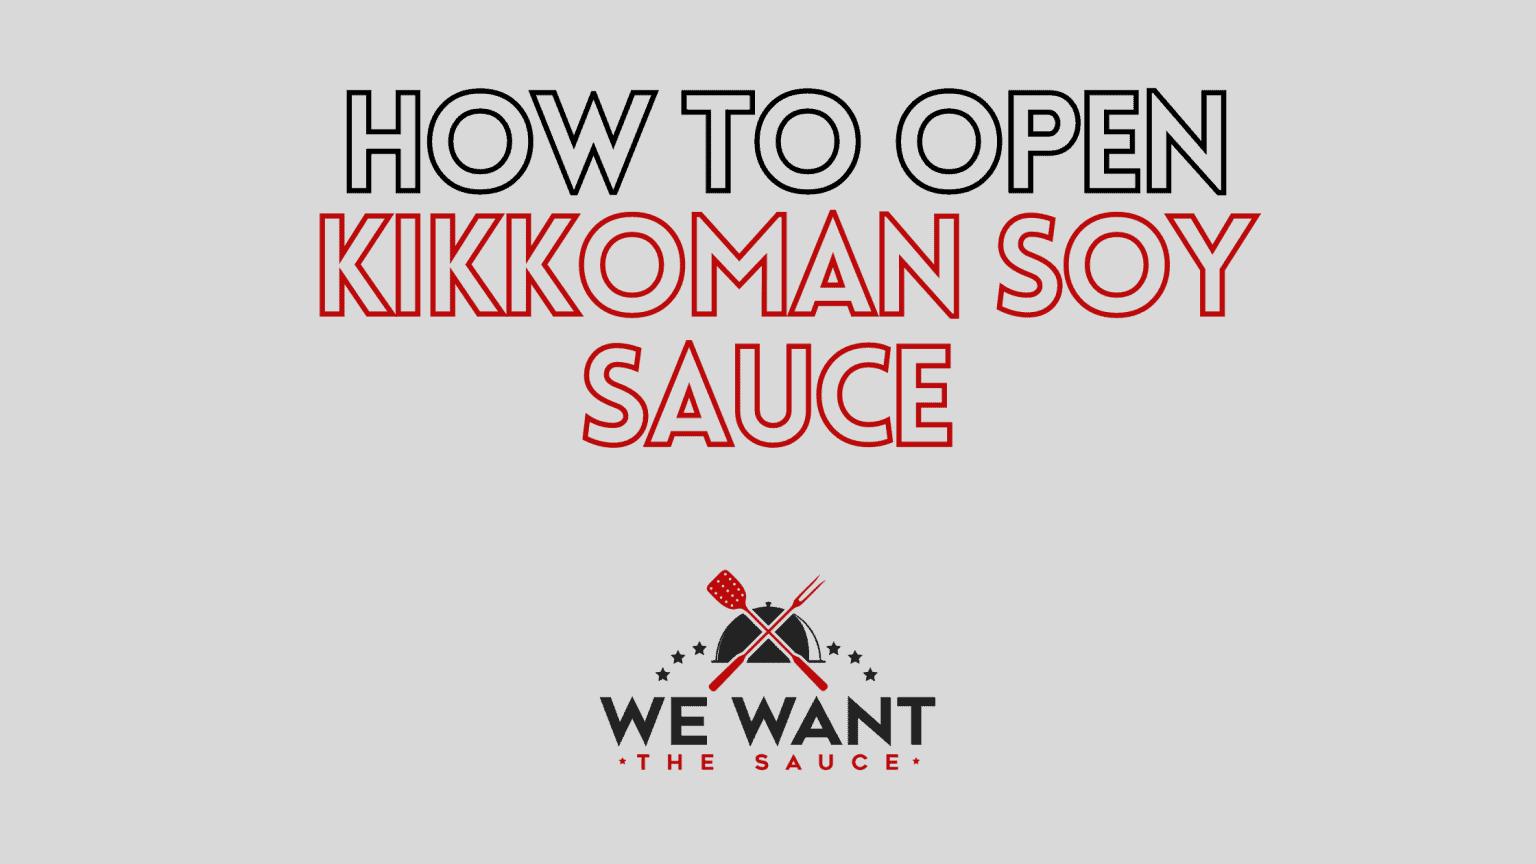 How To Open Kikkoman Soy Sauce